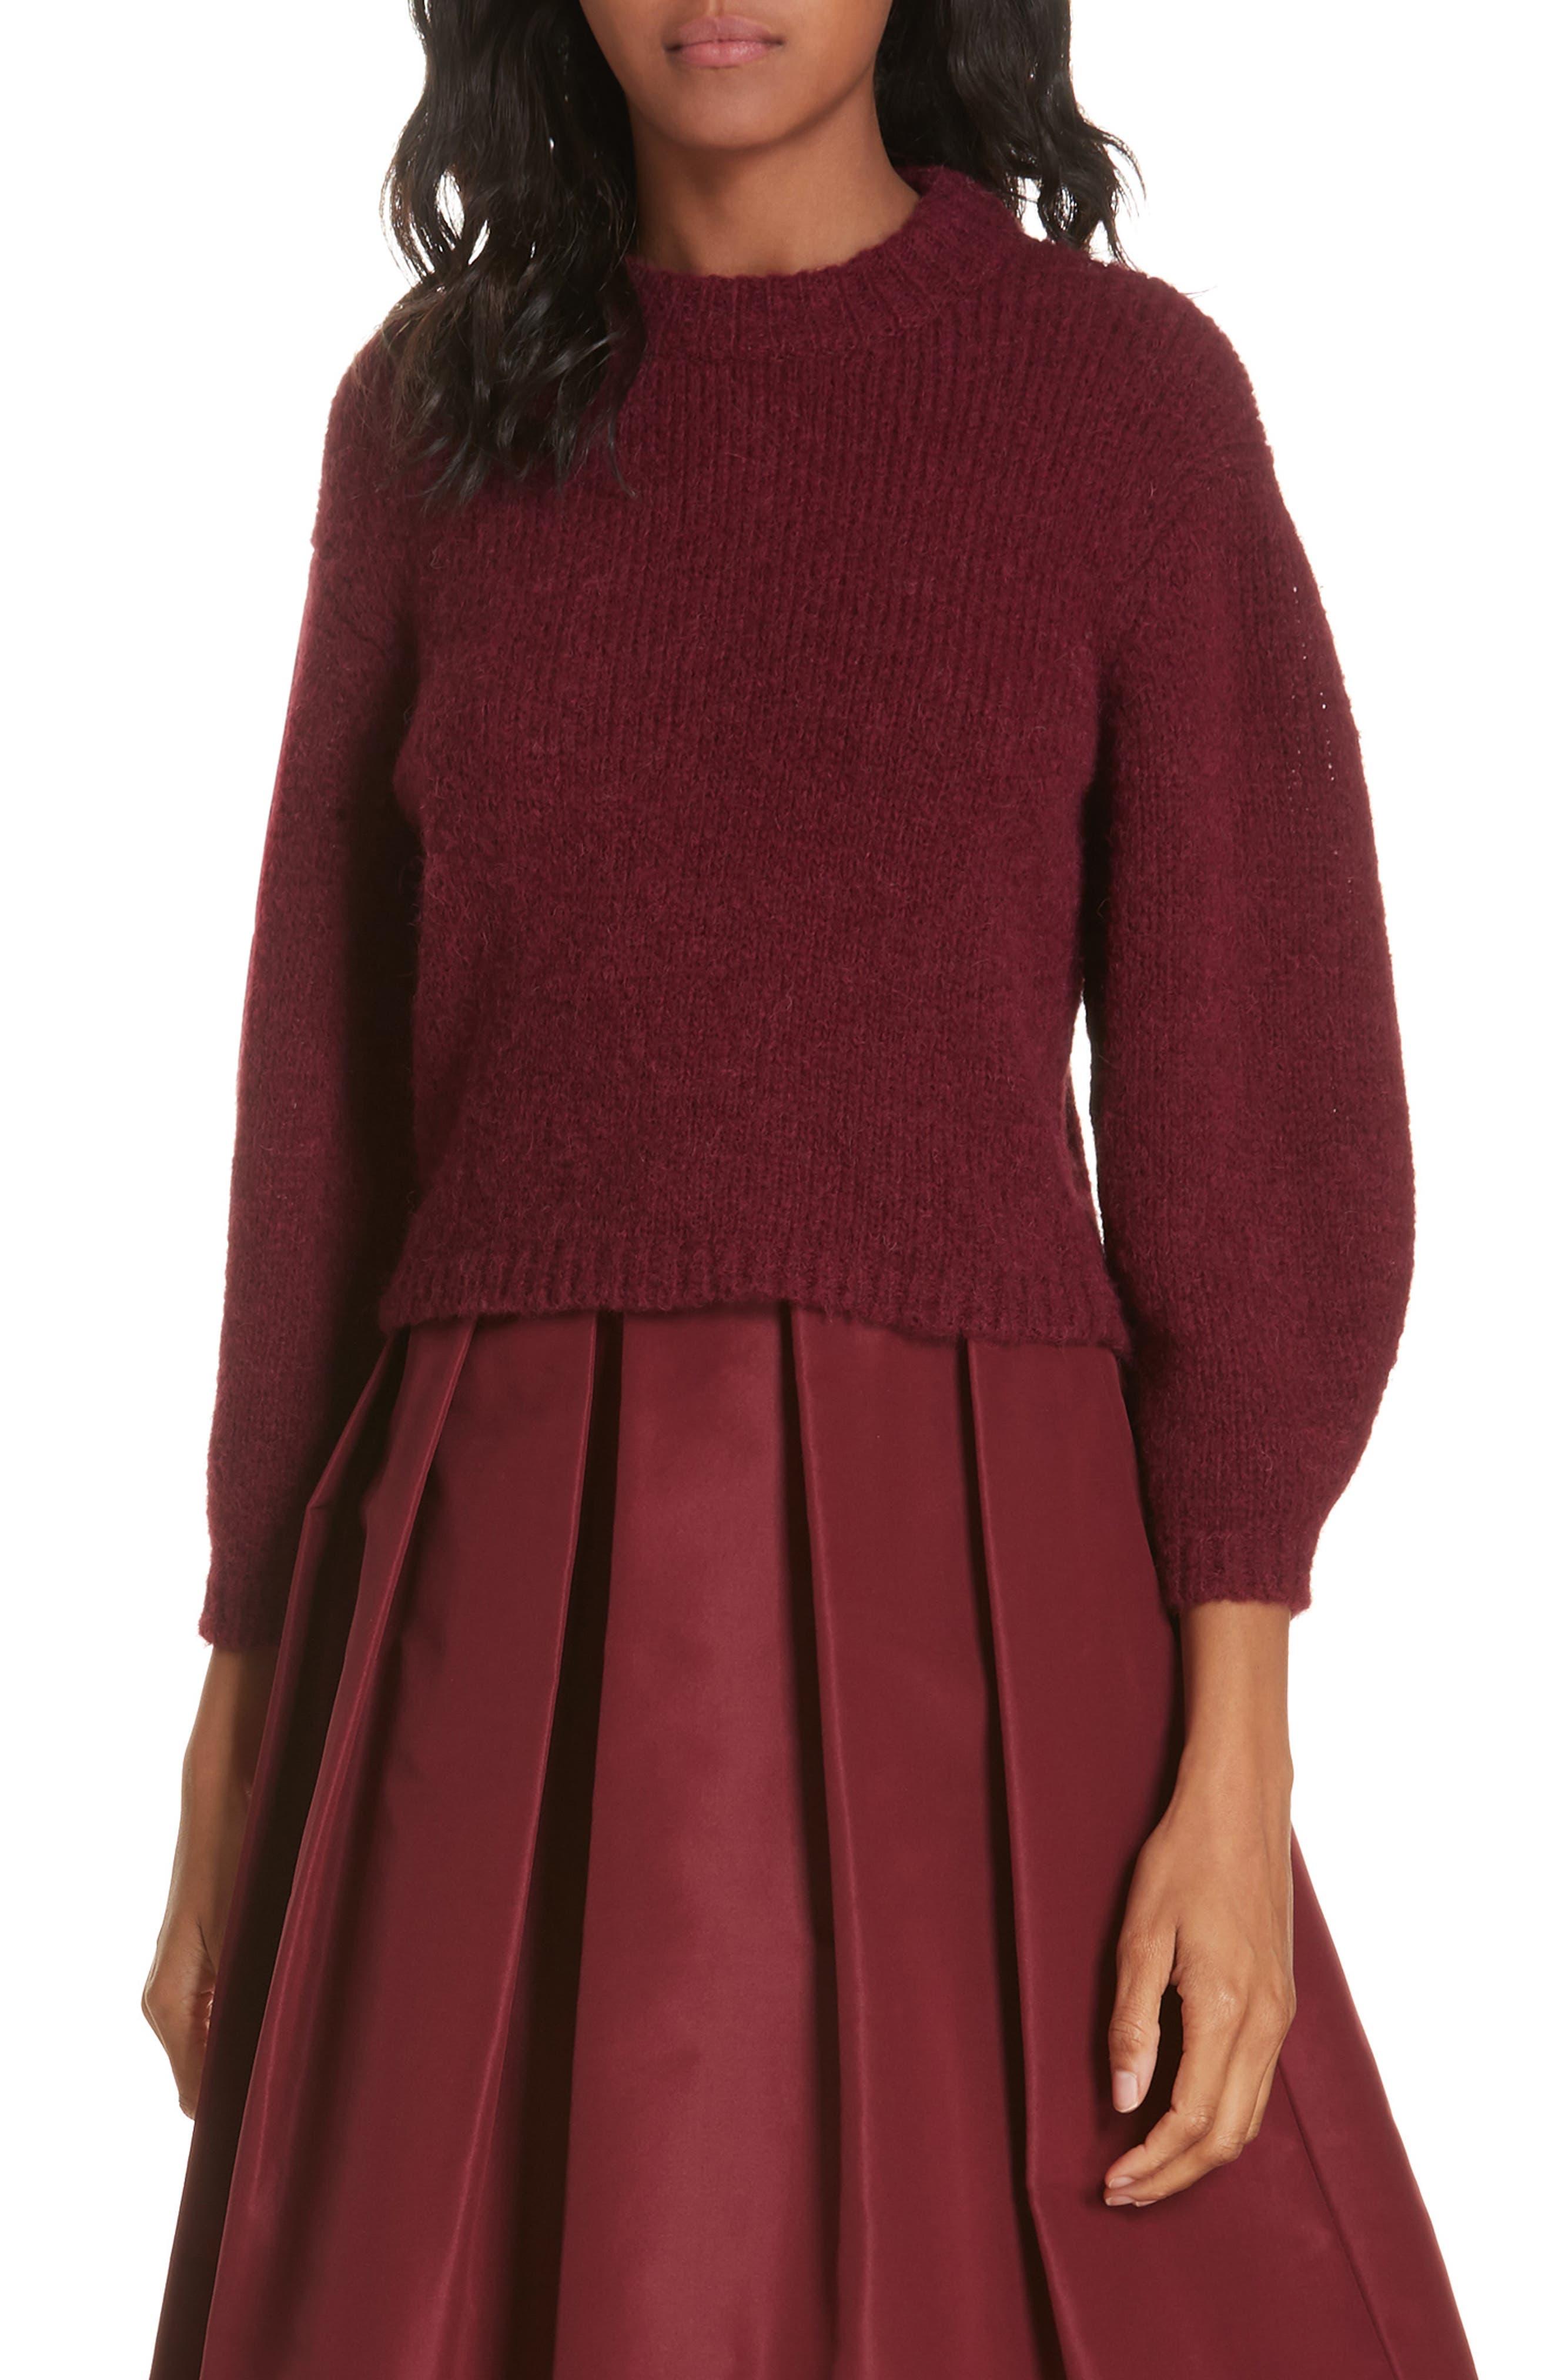 Tibi Cozette Alpaca & Wool Blend Crop Sweater, Burgundy